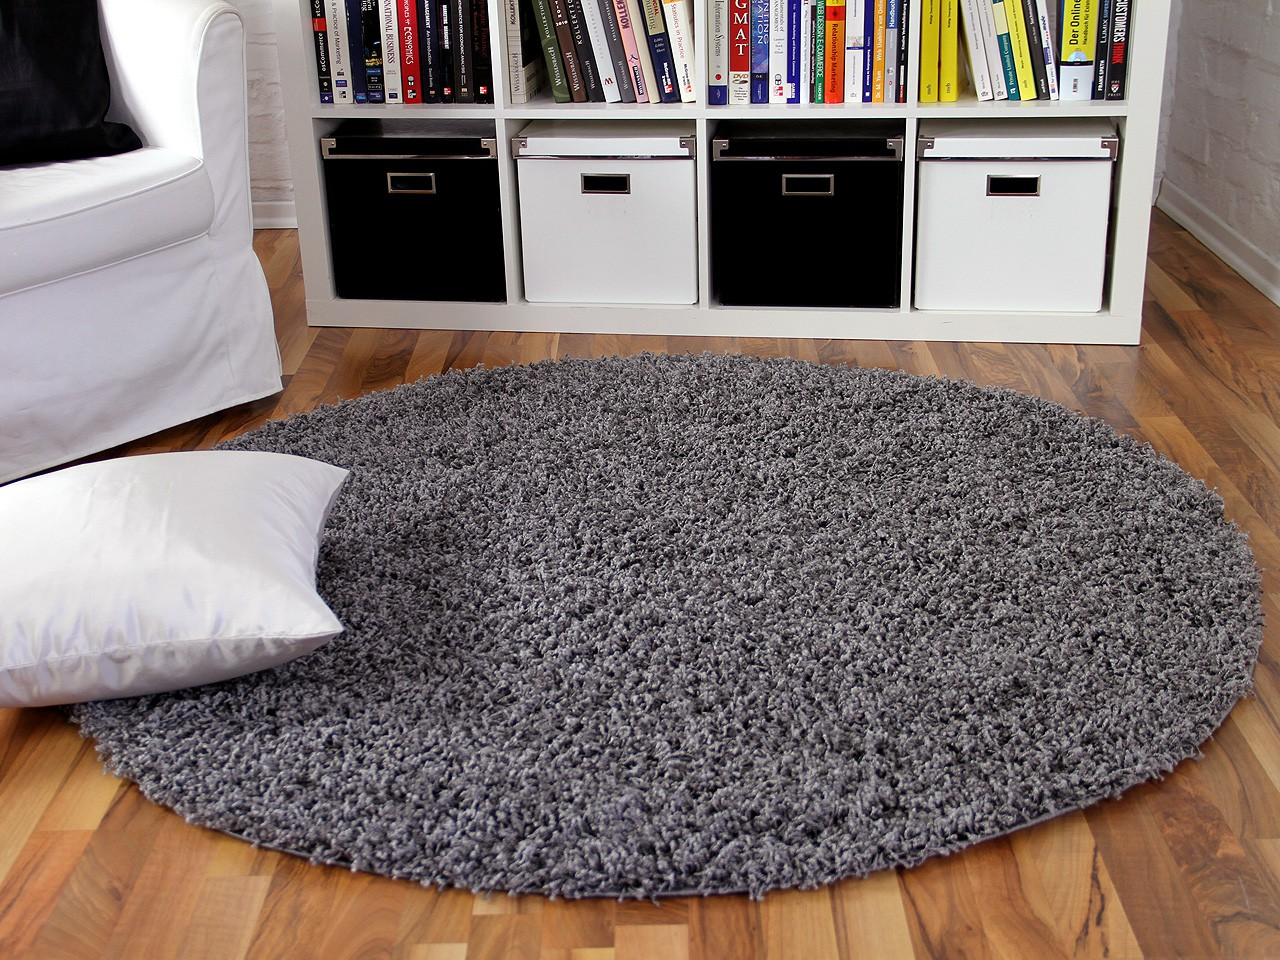 hochflor langflor shaggy teppich aloha anthrazit rund teppiche hochflor langflor teppiche. Black Bedroom Furniture Sets. Home Design Ideas